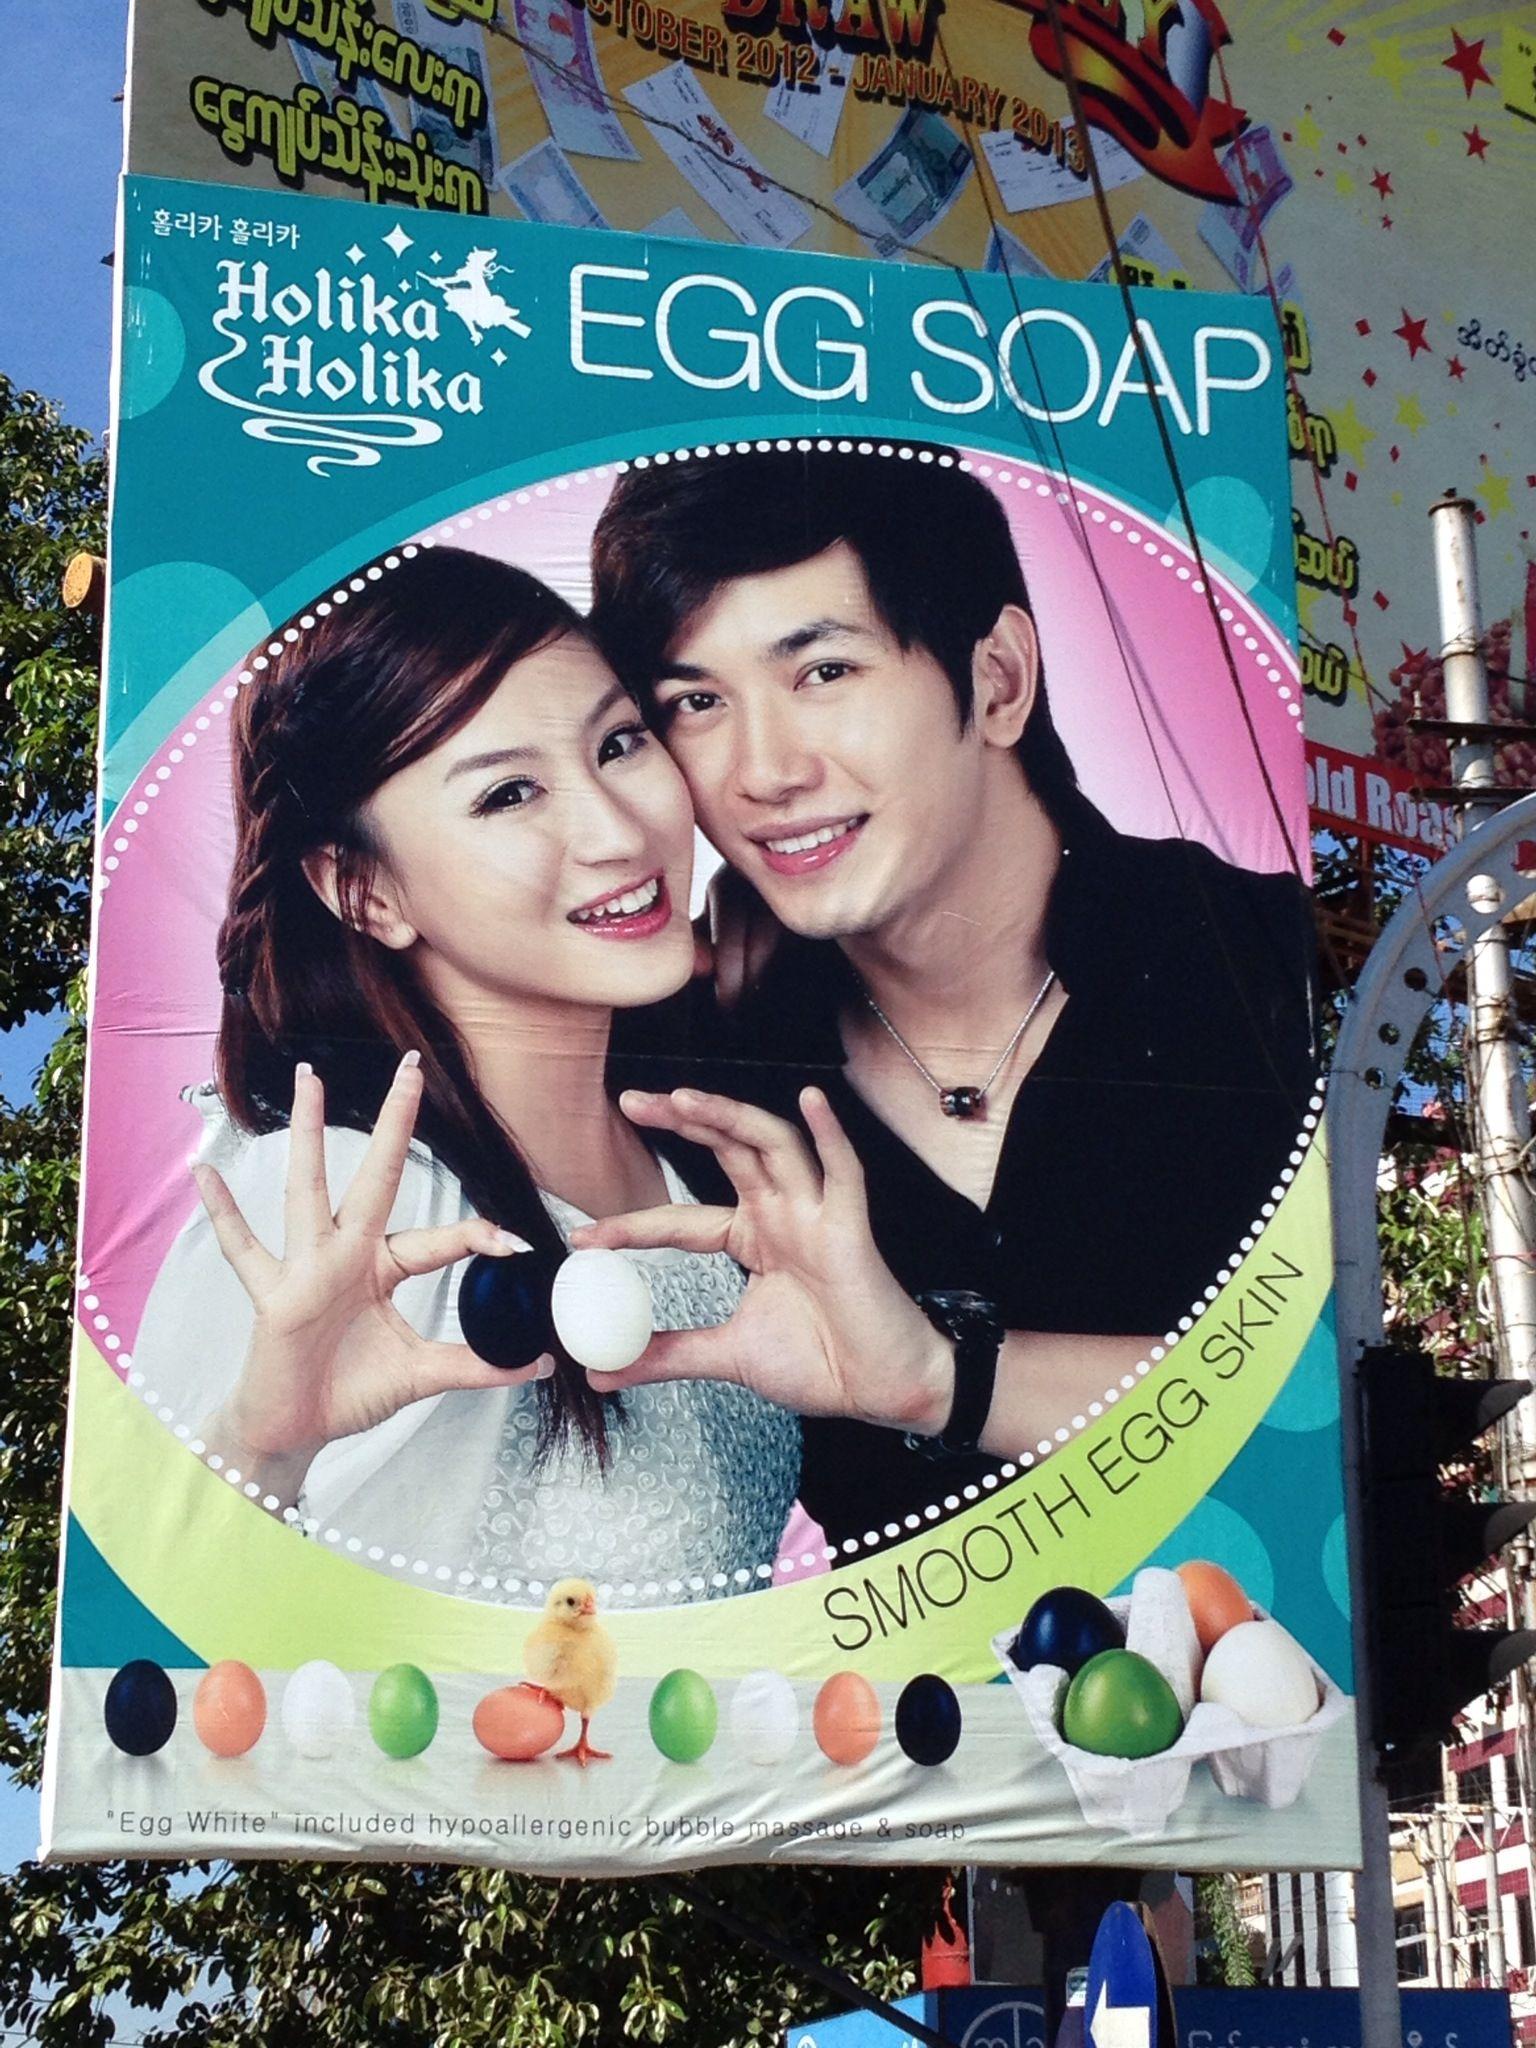 Wunderbare Werbung aus Myanmar